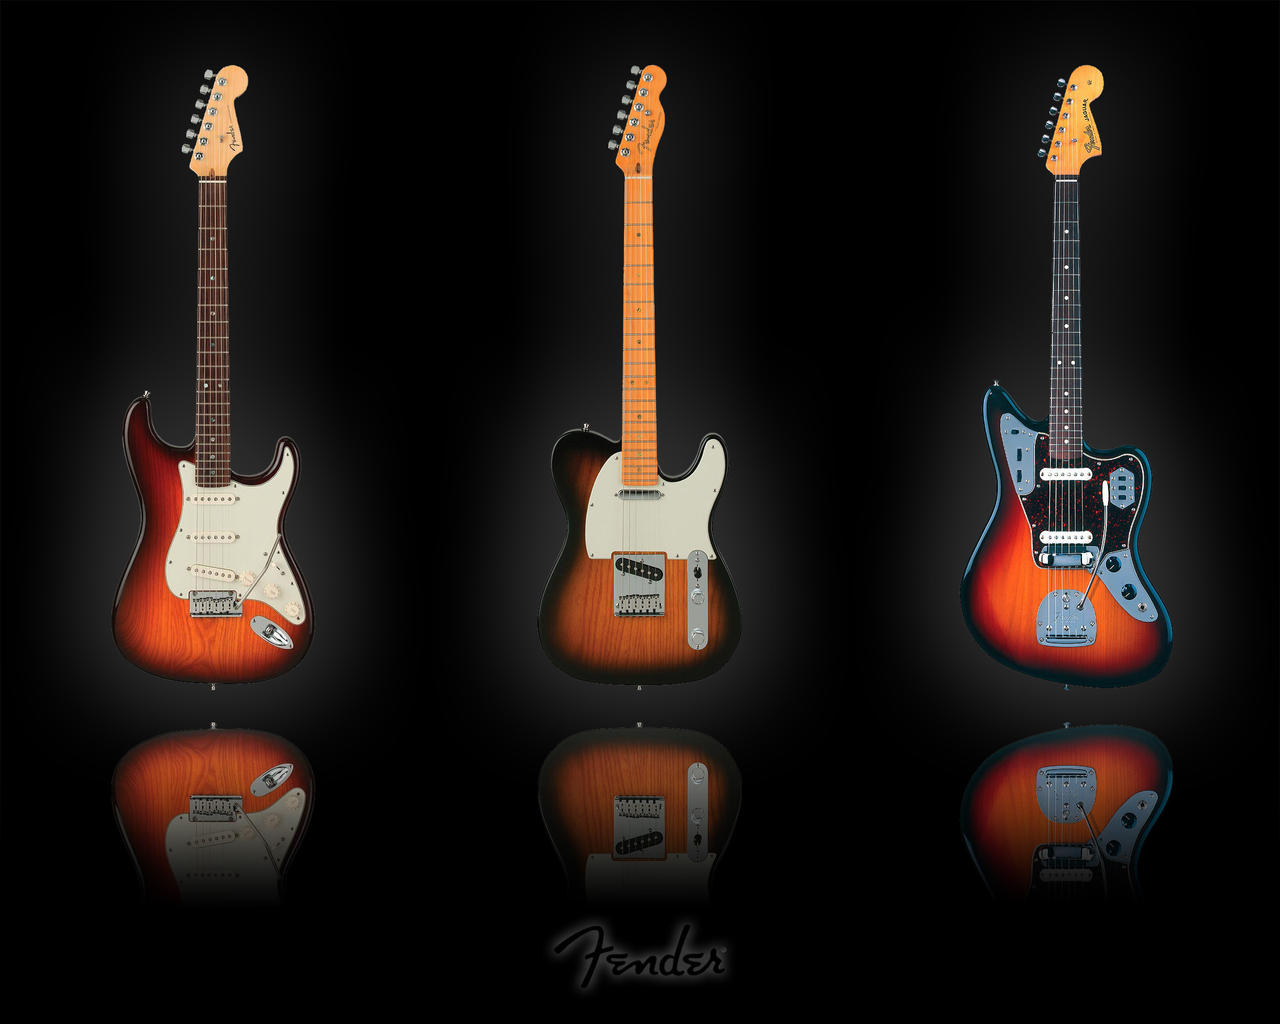 guitar fender stratocaster music - photo #30